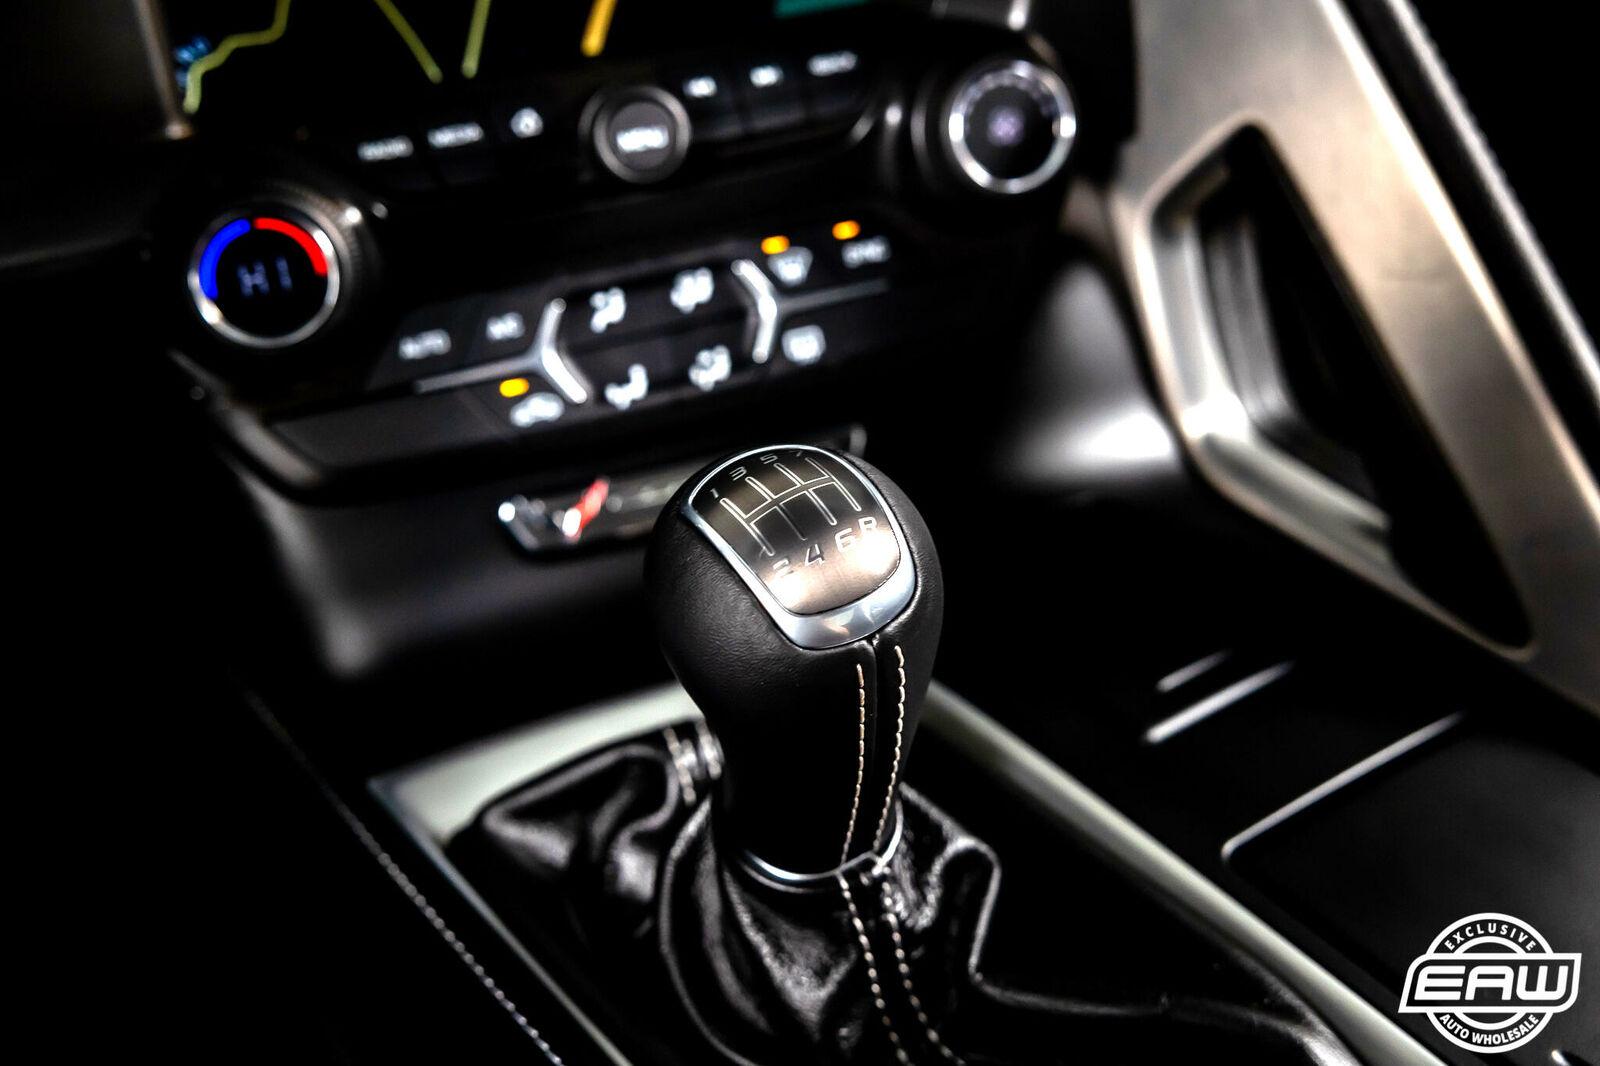 2014 Black Chevrolet Corvette Coupe 1LT | C7 Corvette Photo 10